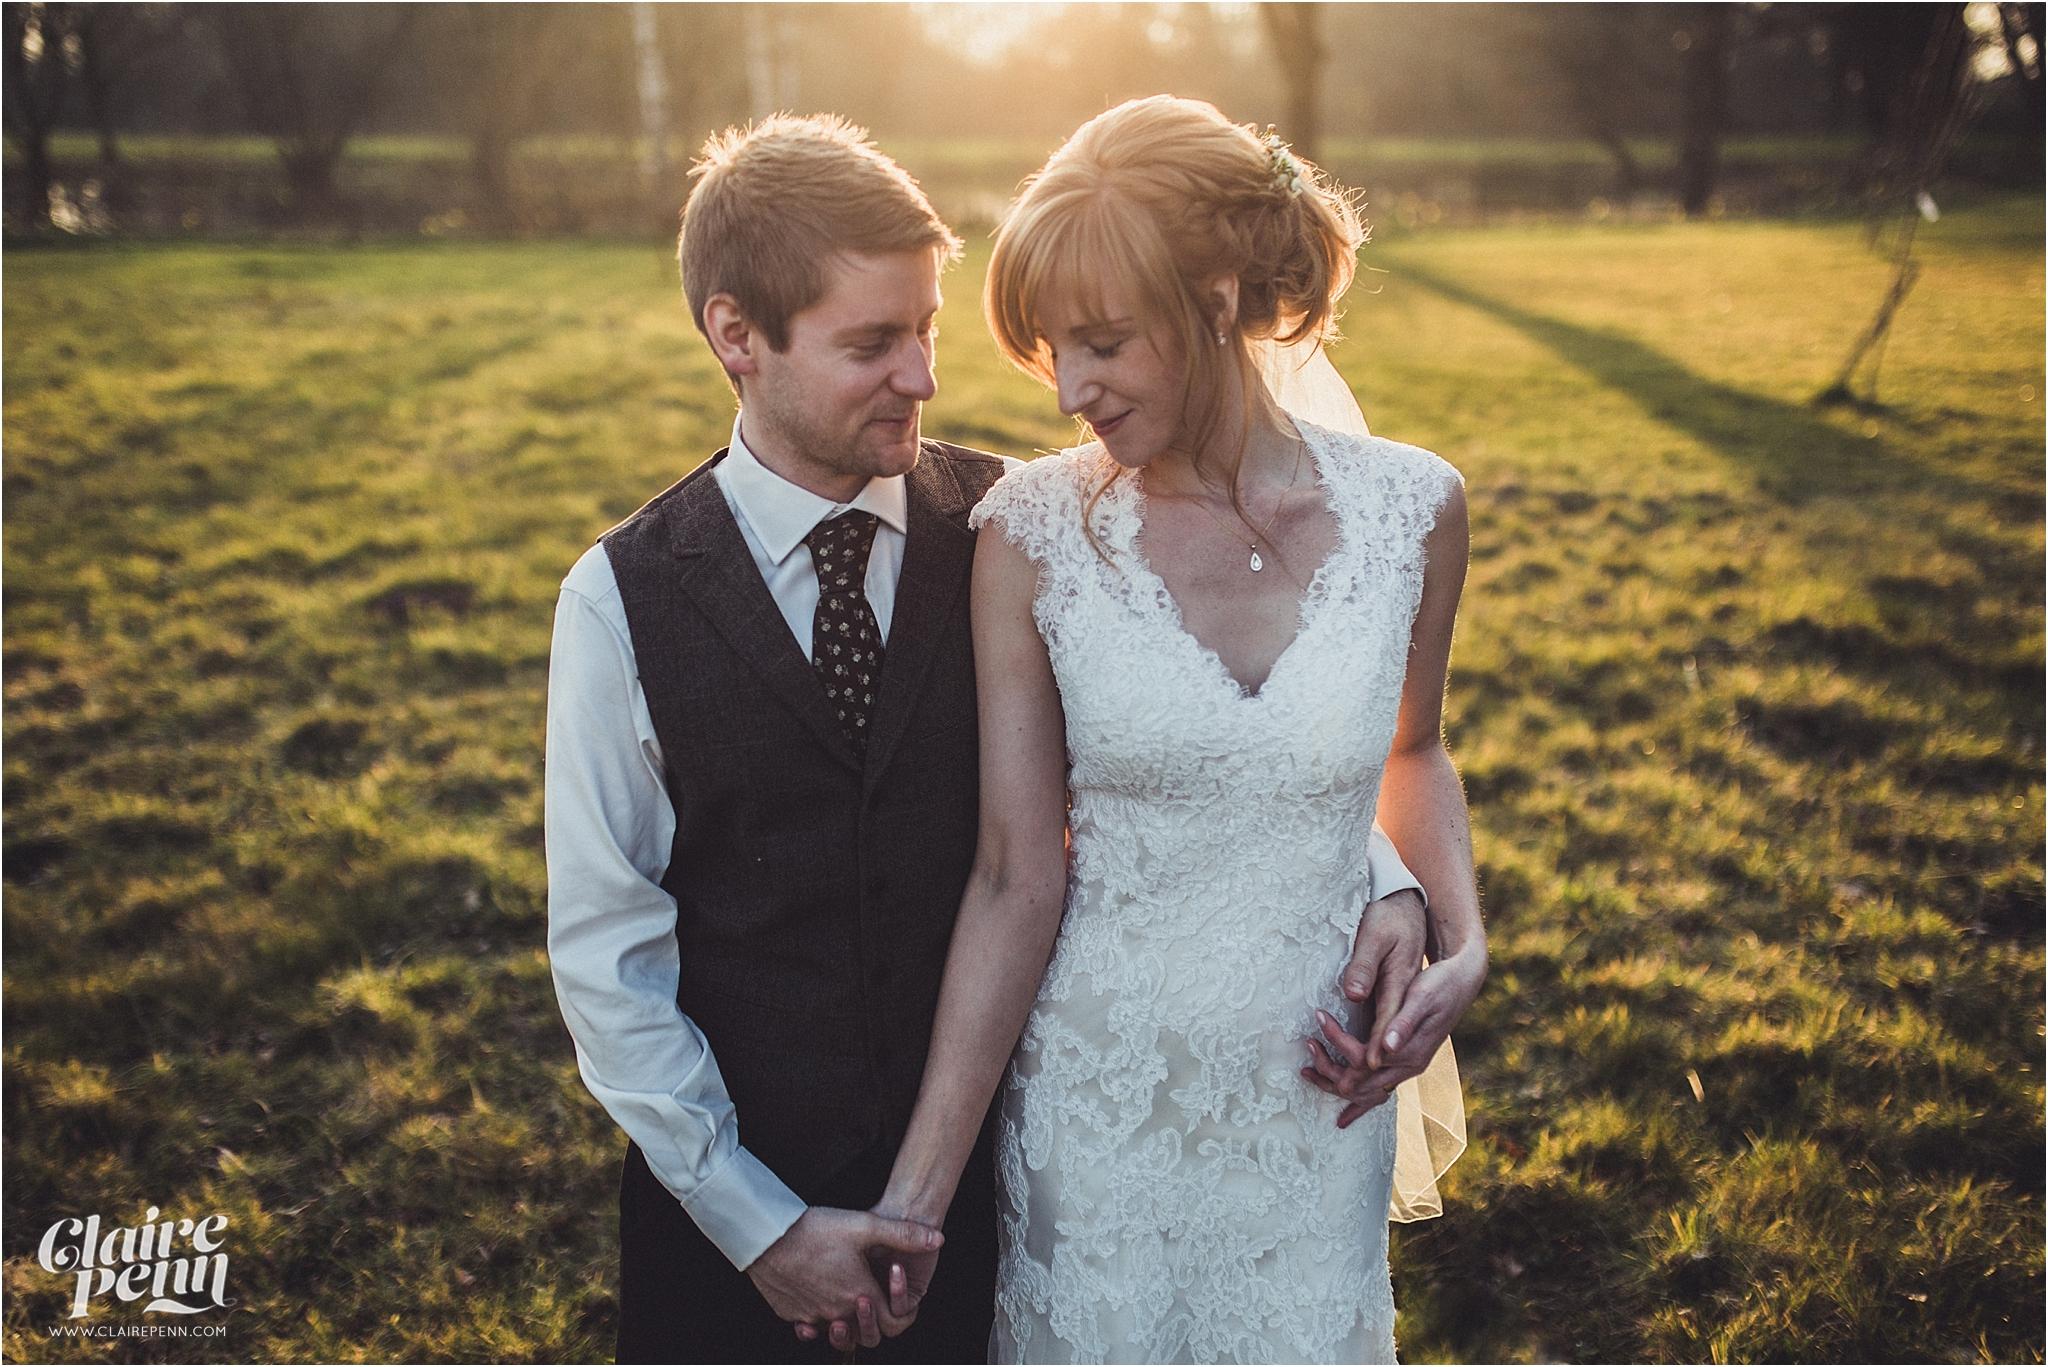 Iscoyd Park wedding, Whitchurch, Cheshire wedding photographer_0053.jpg